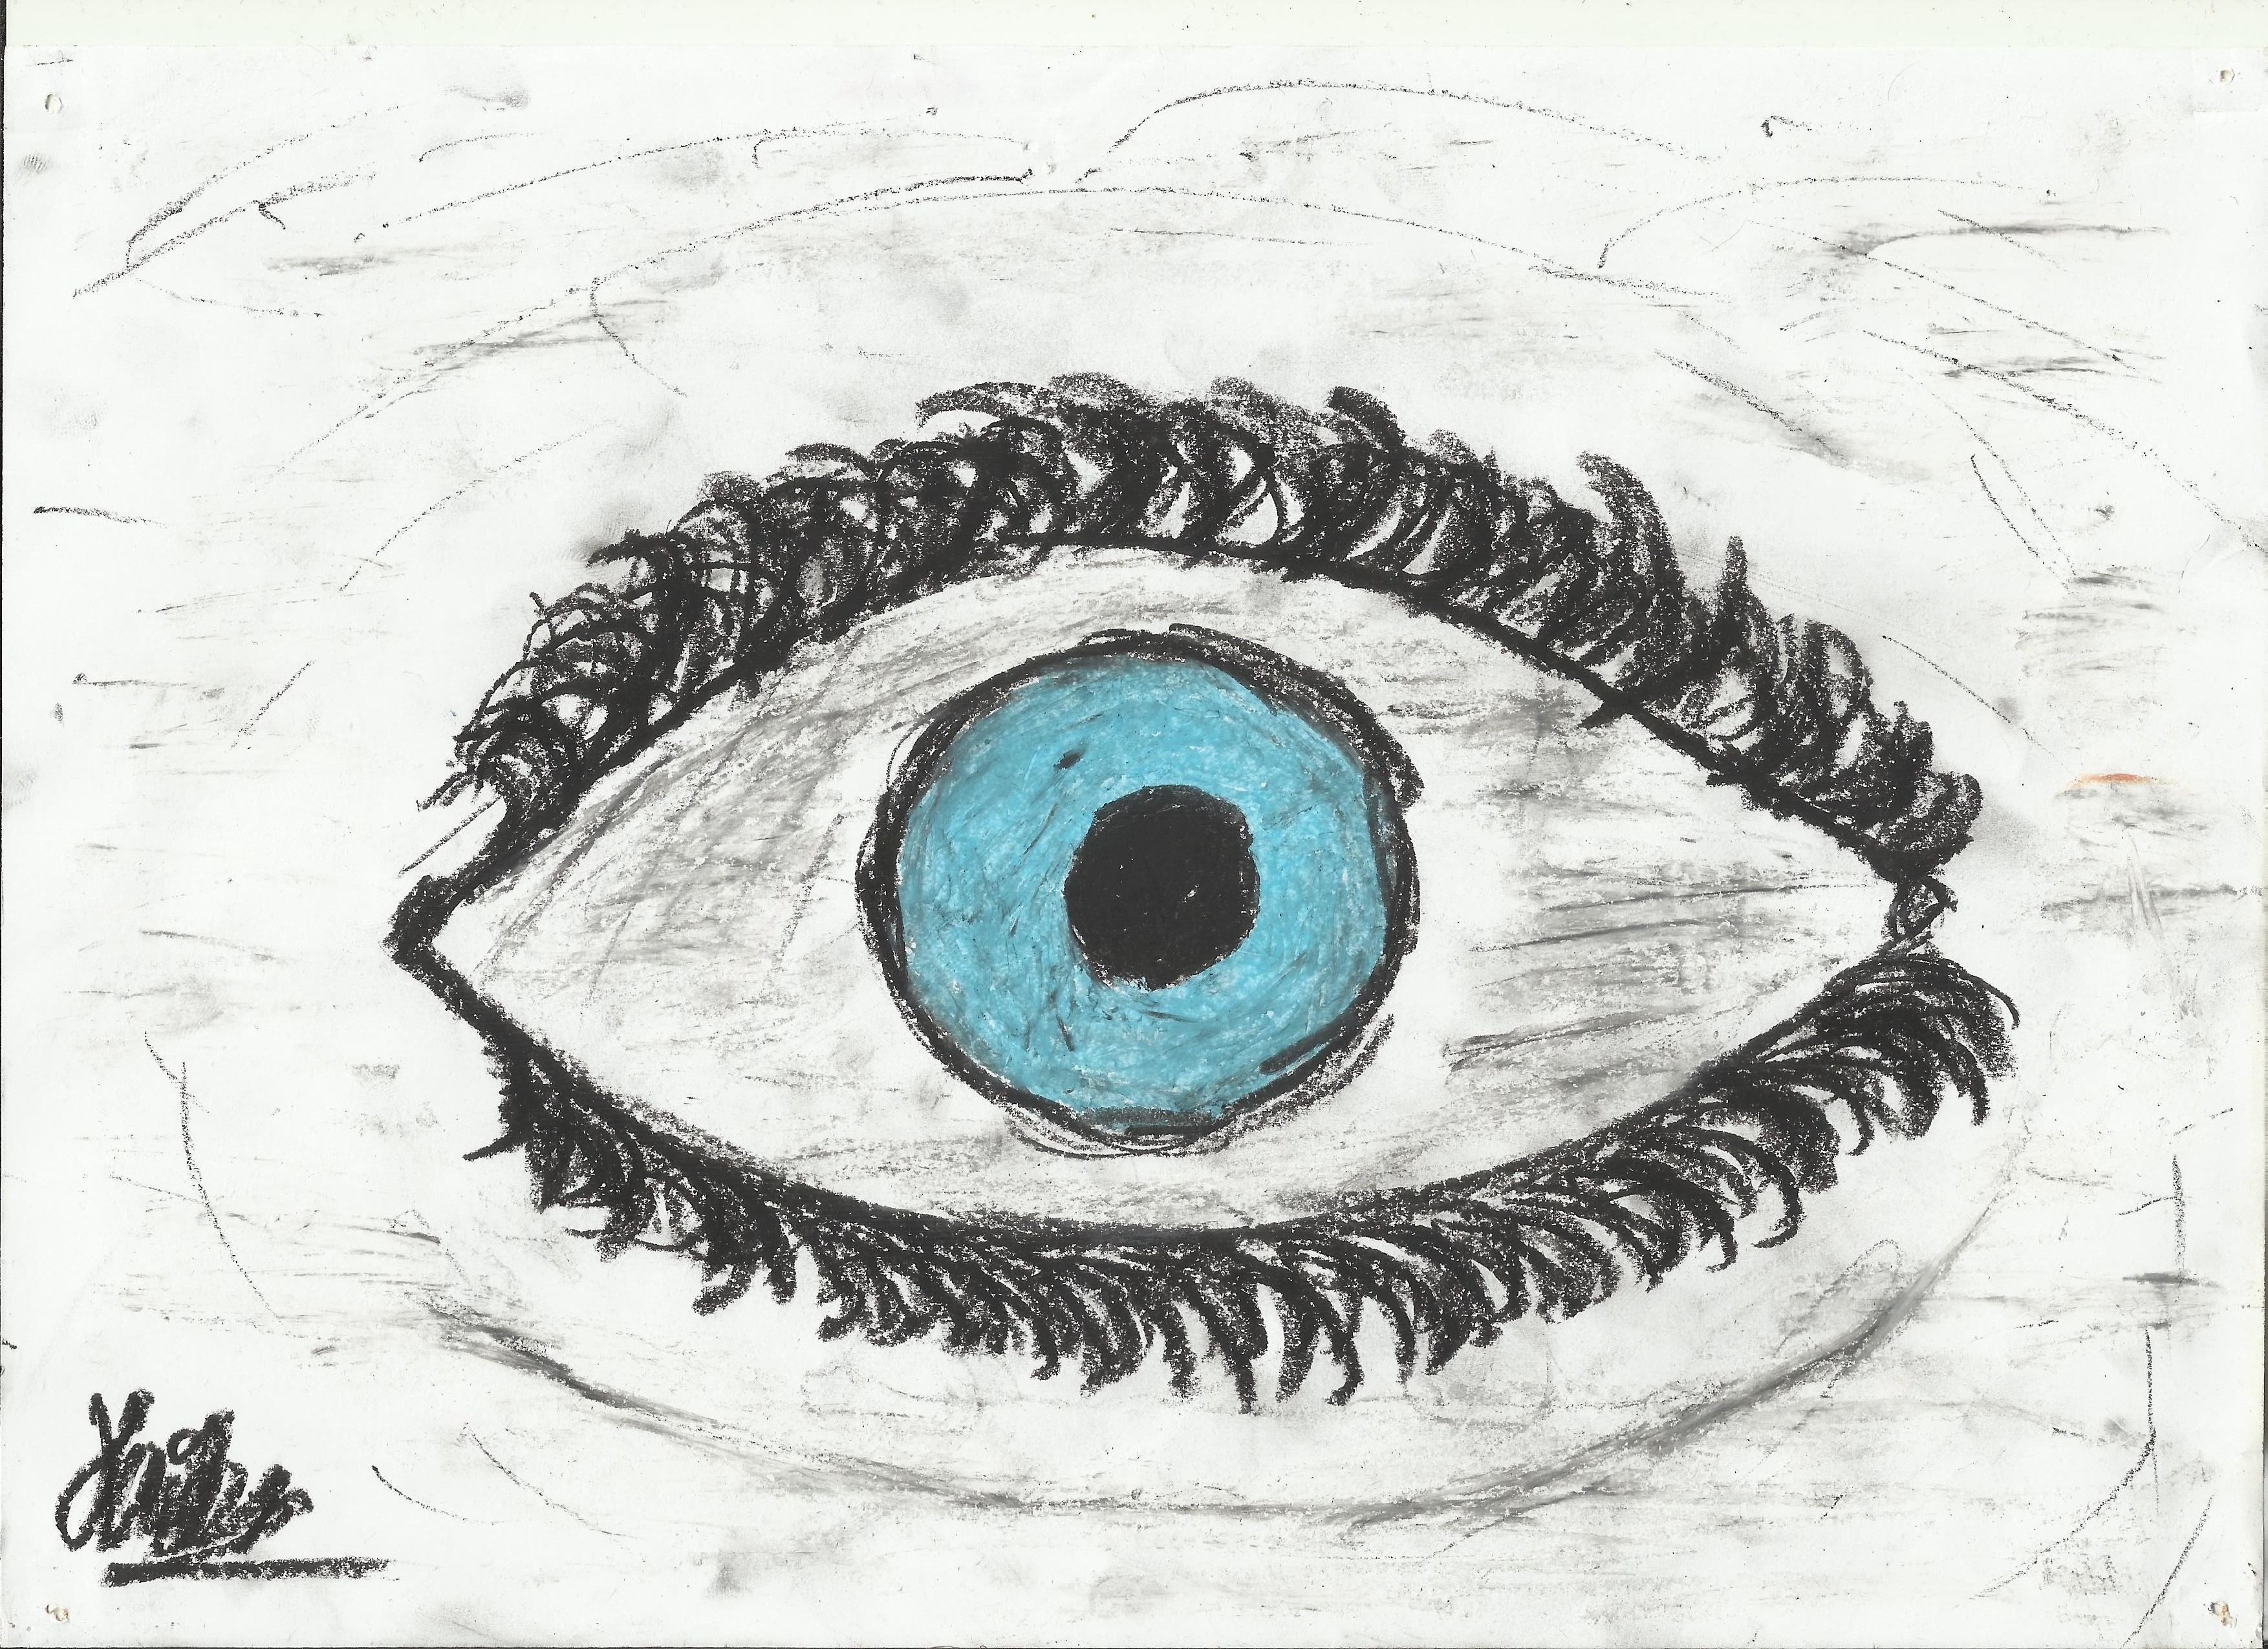 Behind Blue Eye's